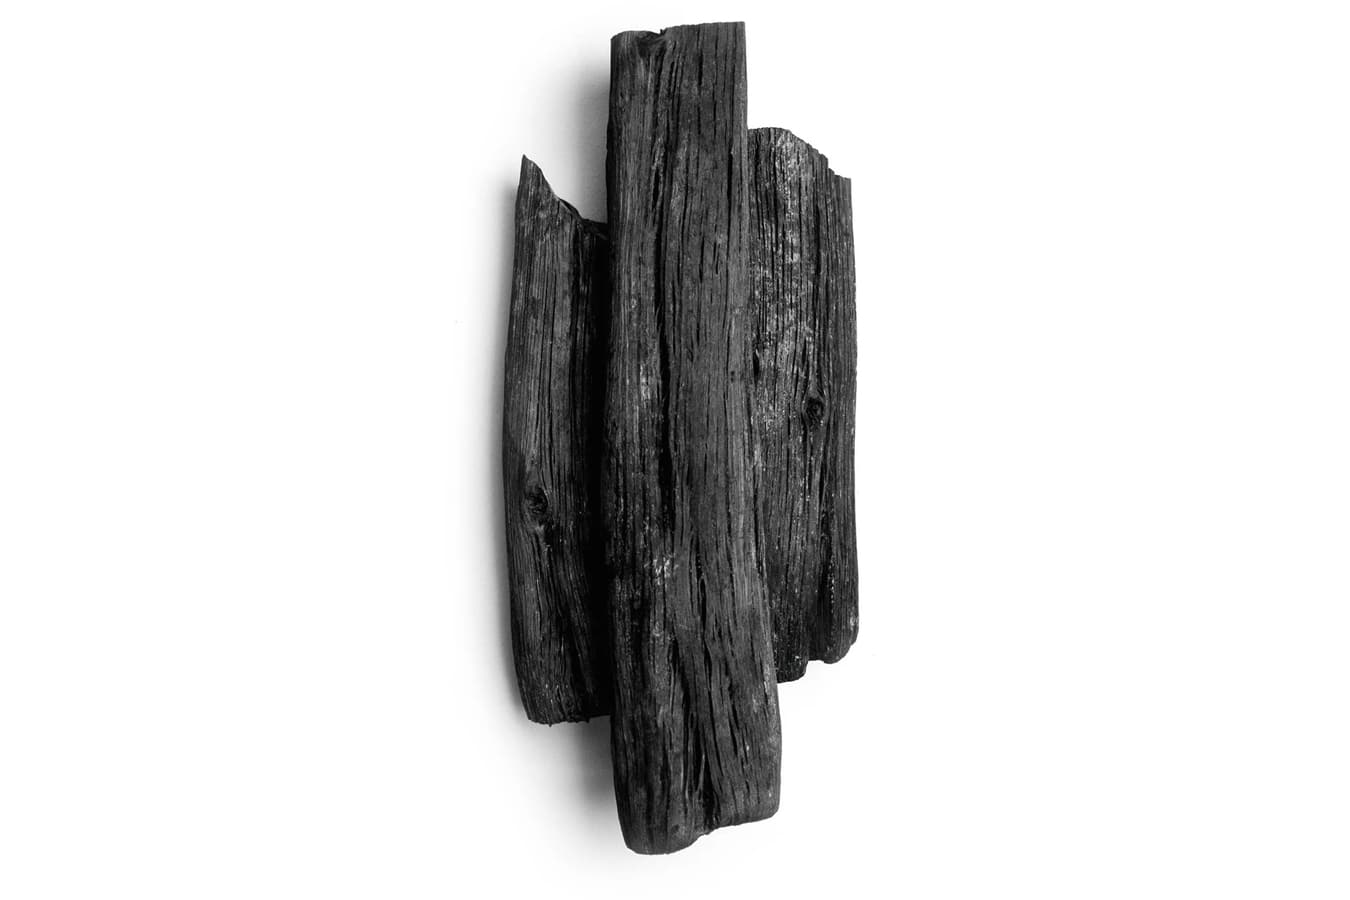 morihata kishu binchotan charcoal